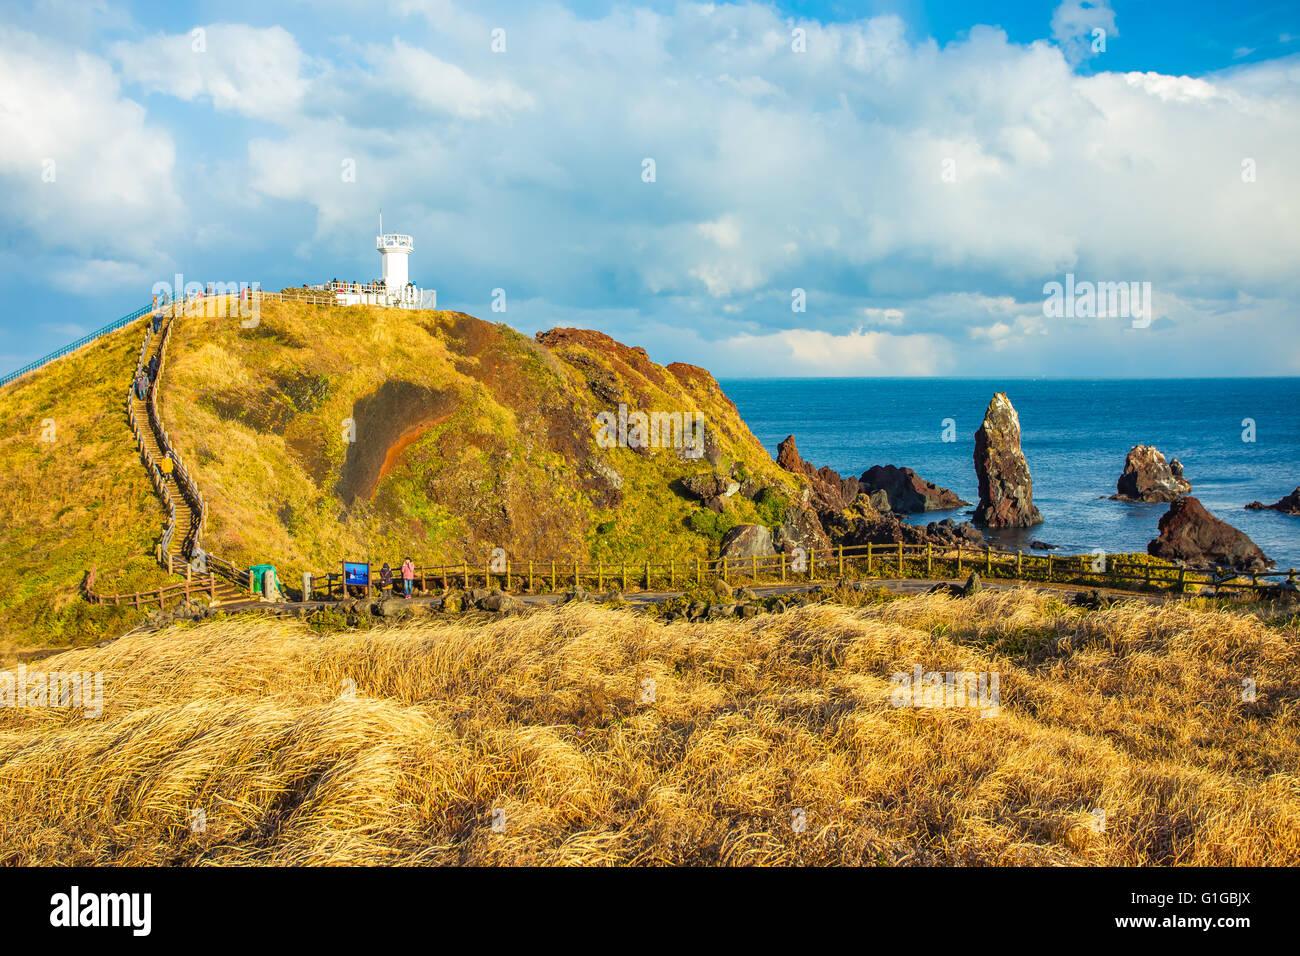 View of Seopjikoji Mountain Jeju Island, South Korea. Stock Photo